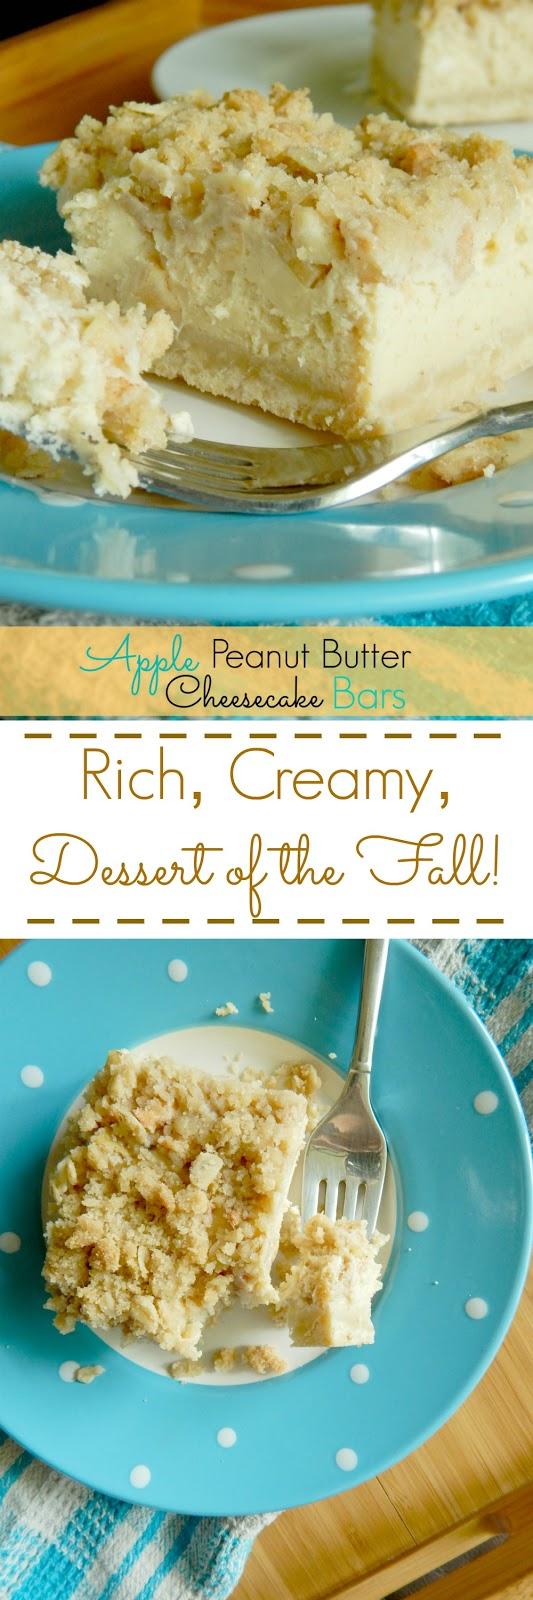 apple peanut butter cheesecake bars (sweetandsavoryfood.com)